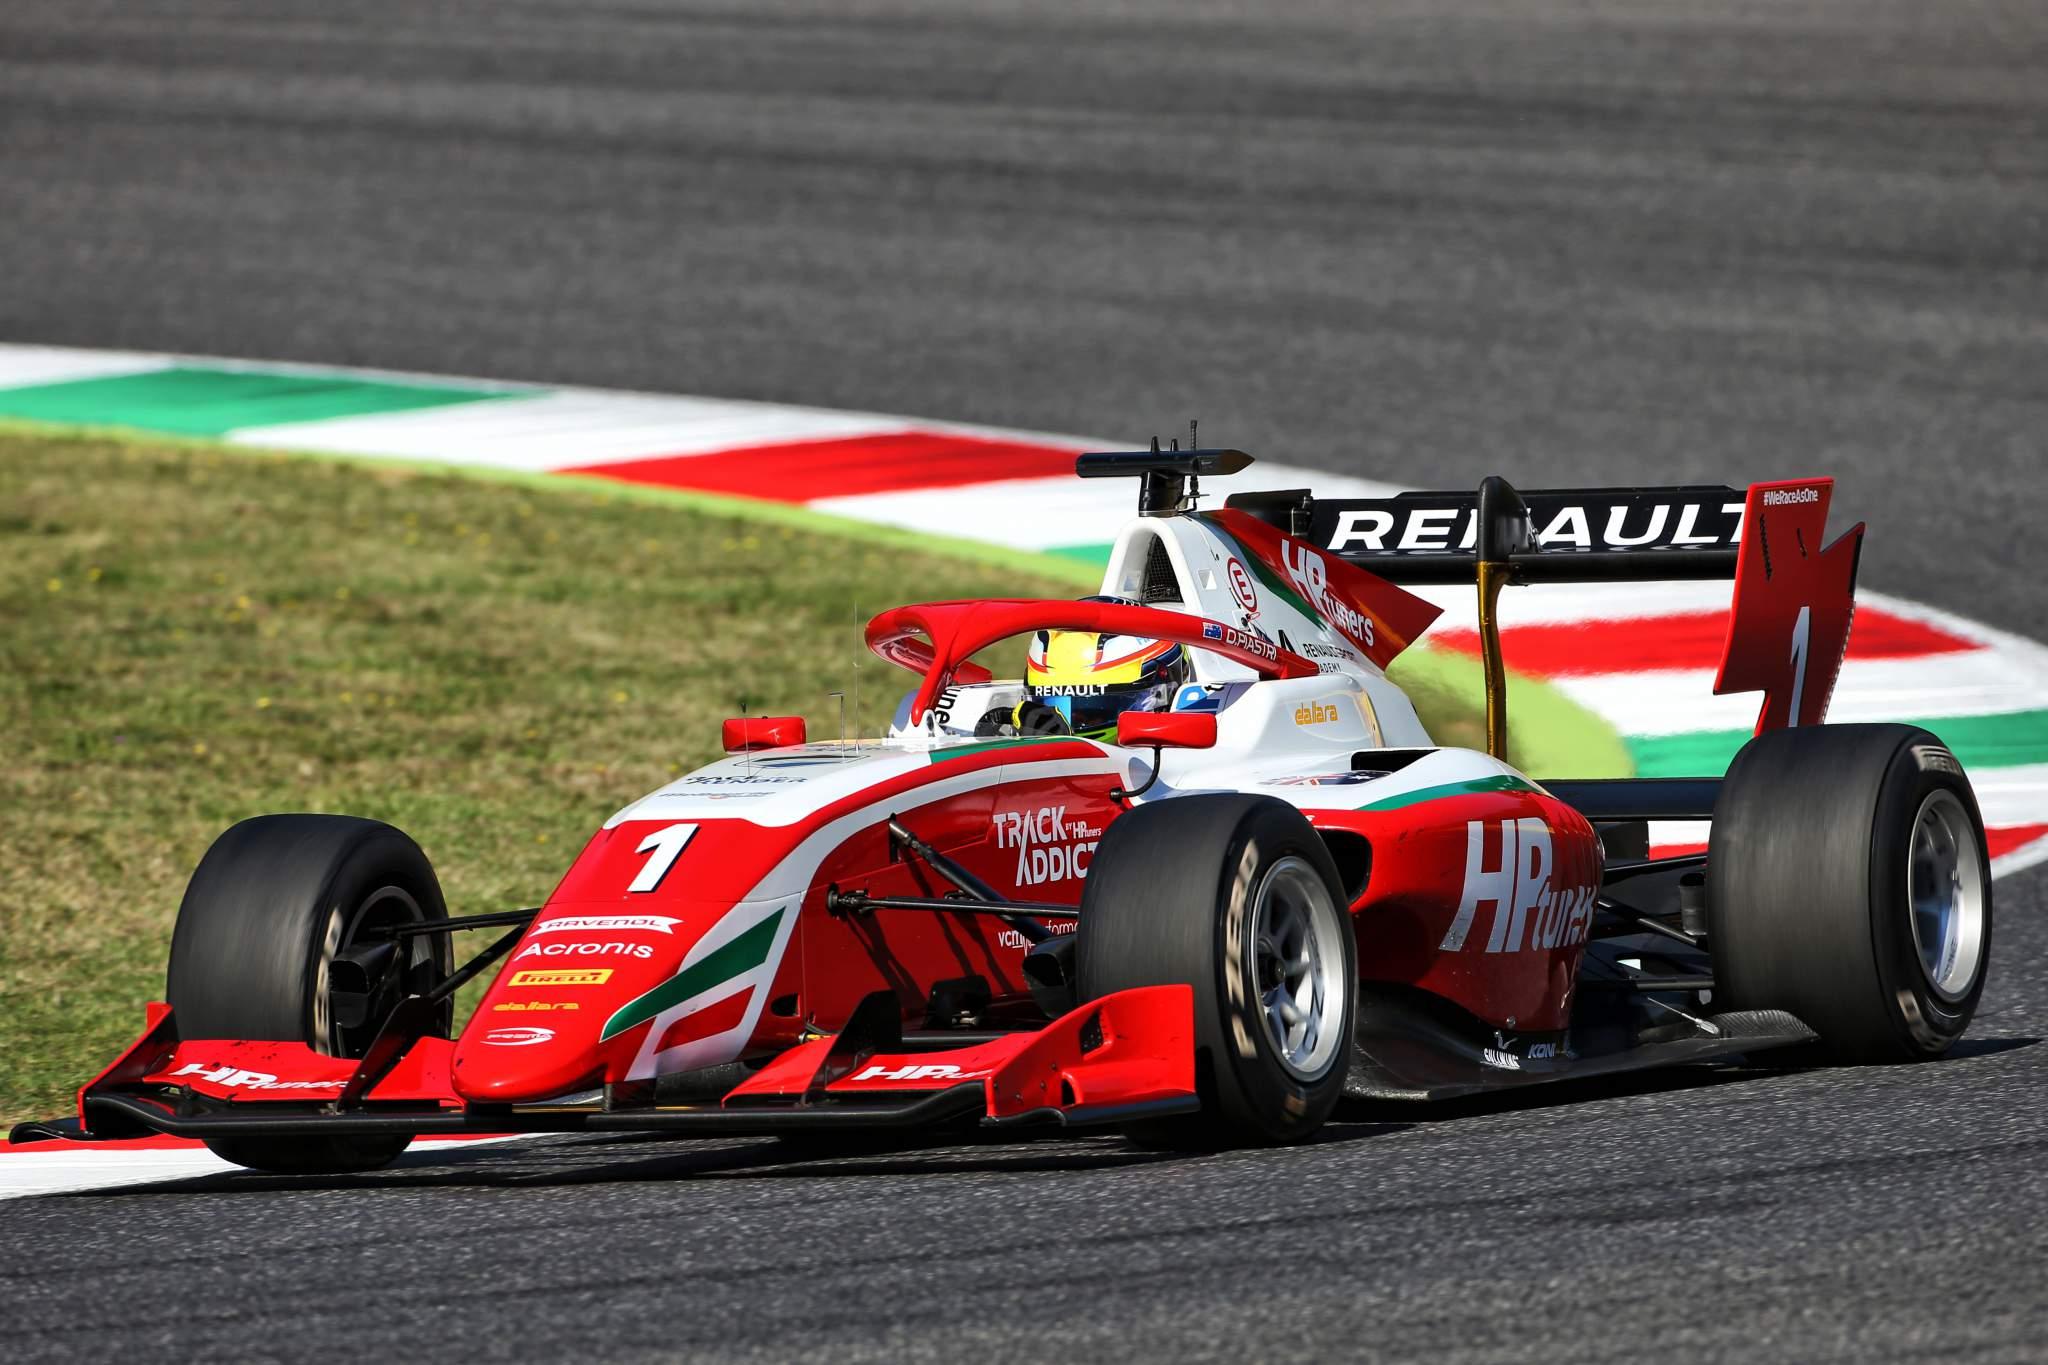 Motor Racing Fia Formula 3 Championship Sunday Mugello, Italy